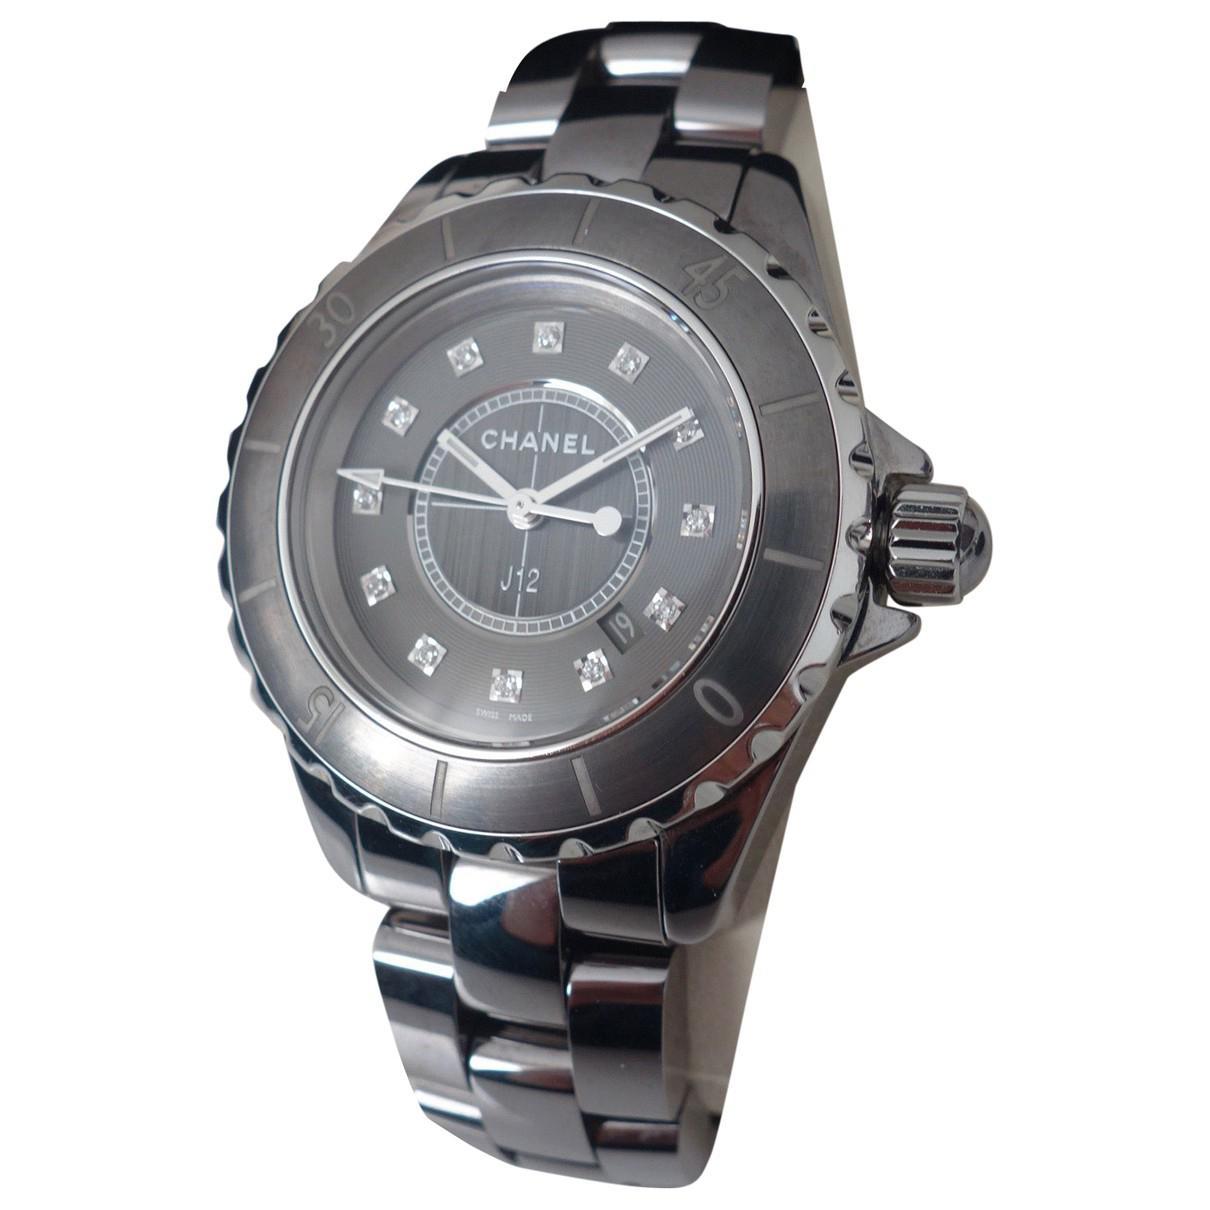 4b9bca3f23128 Chanel J12 Quartz Ceramic Watch in Gray for Men - Lyst